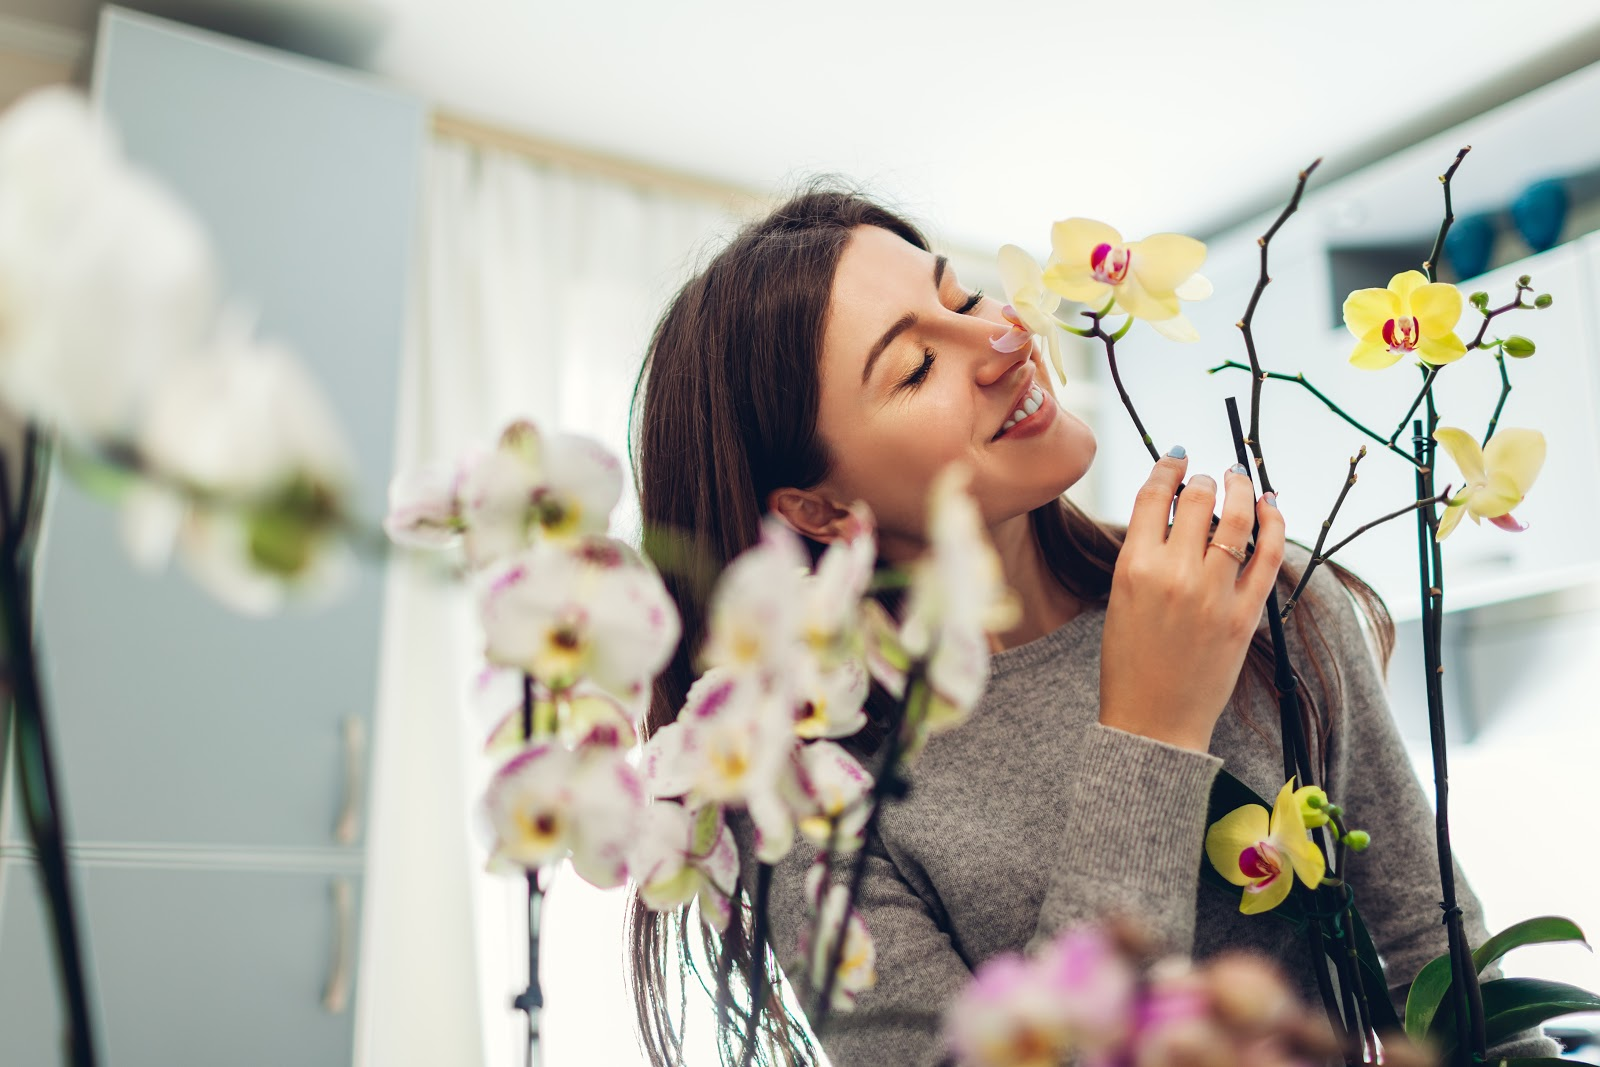 A woman enjoying her houseplants